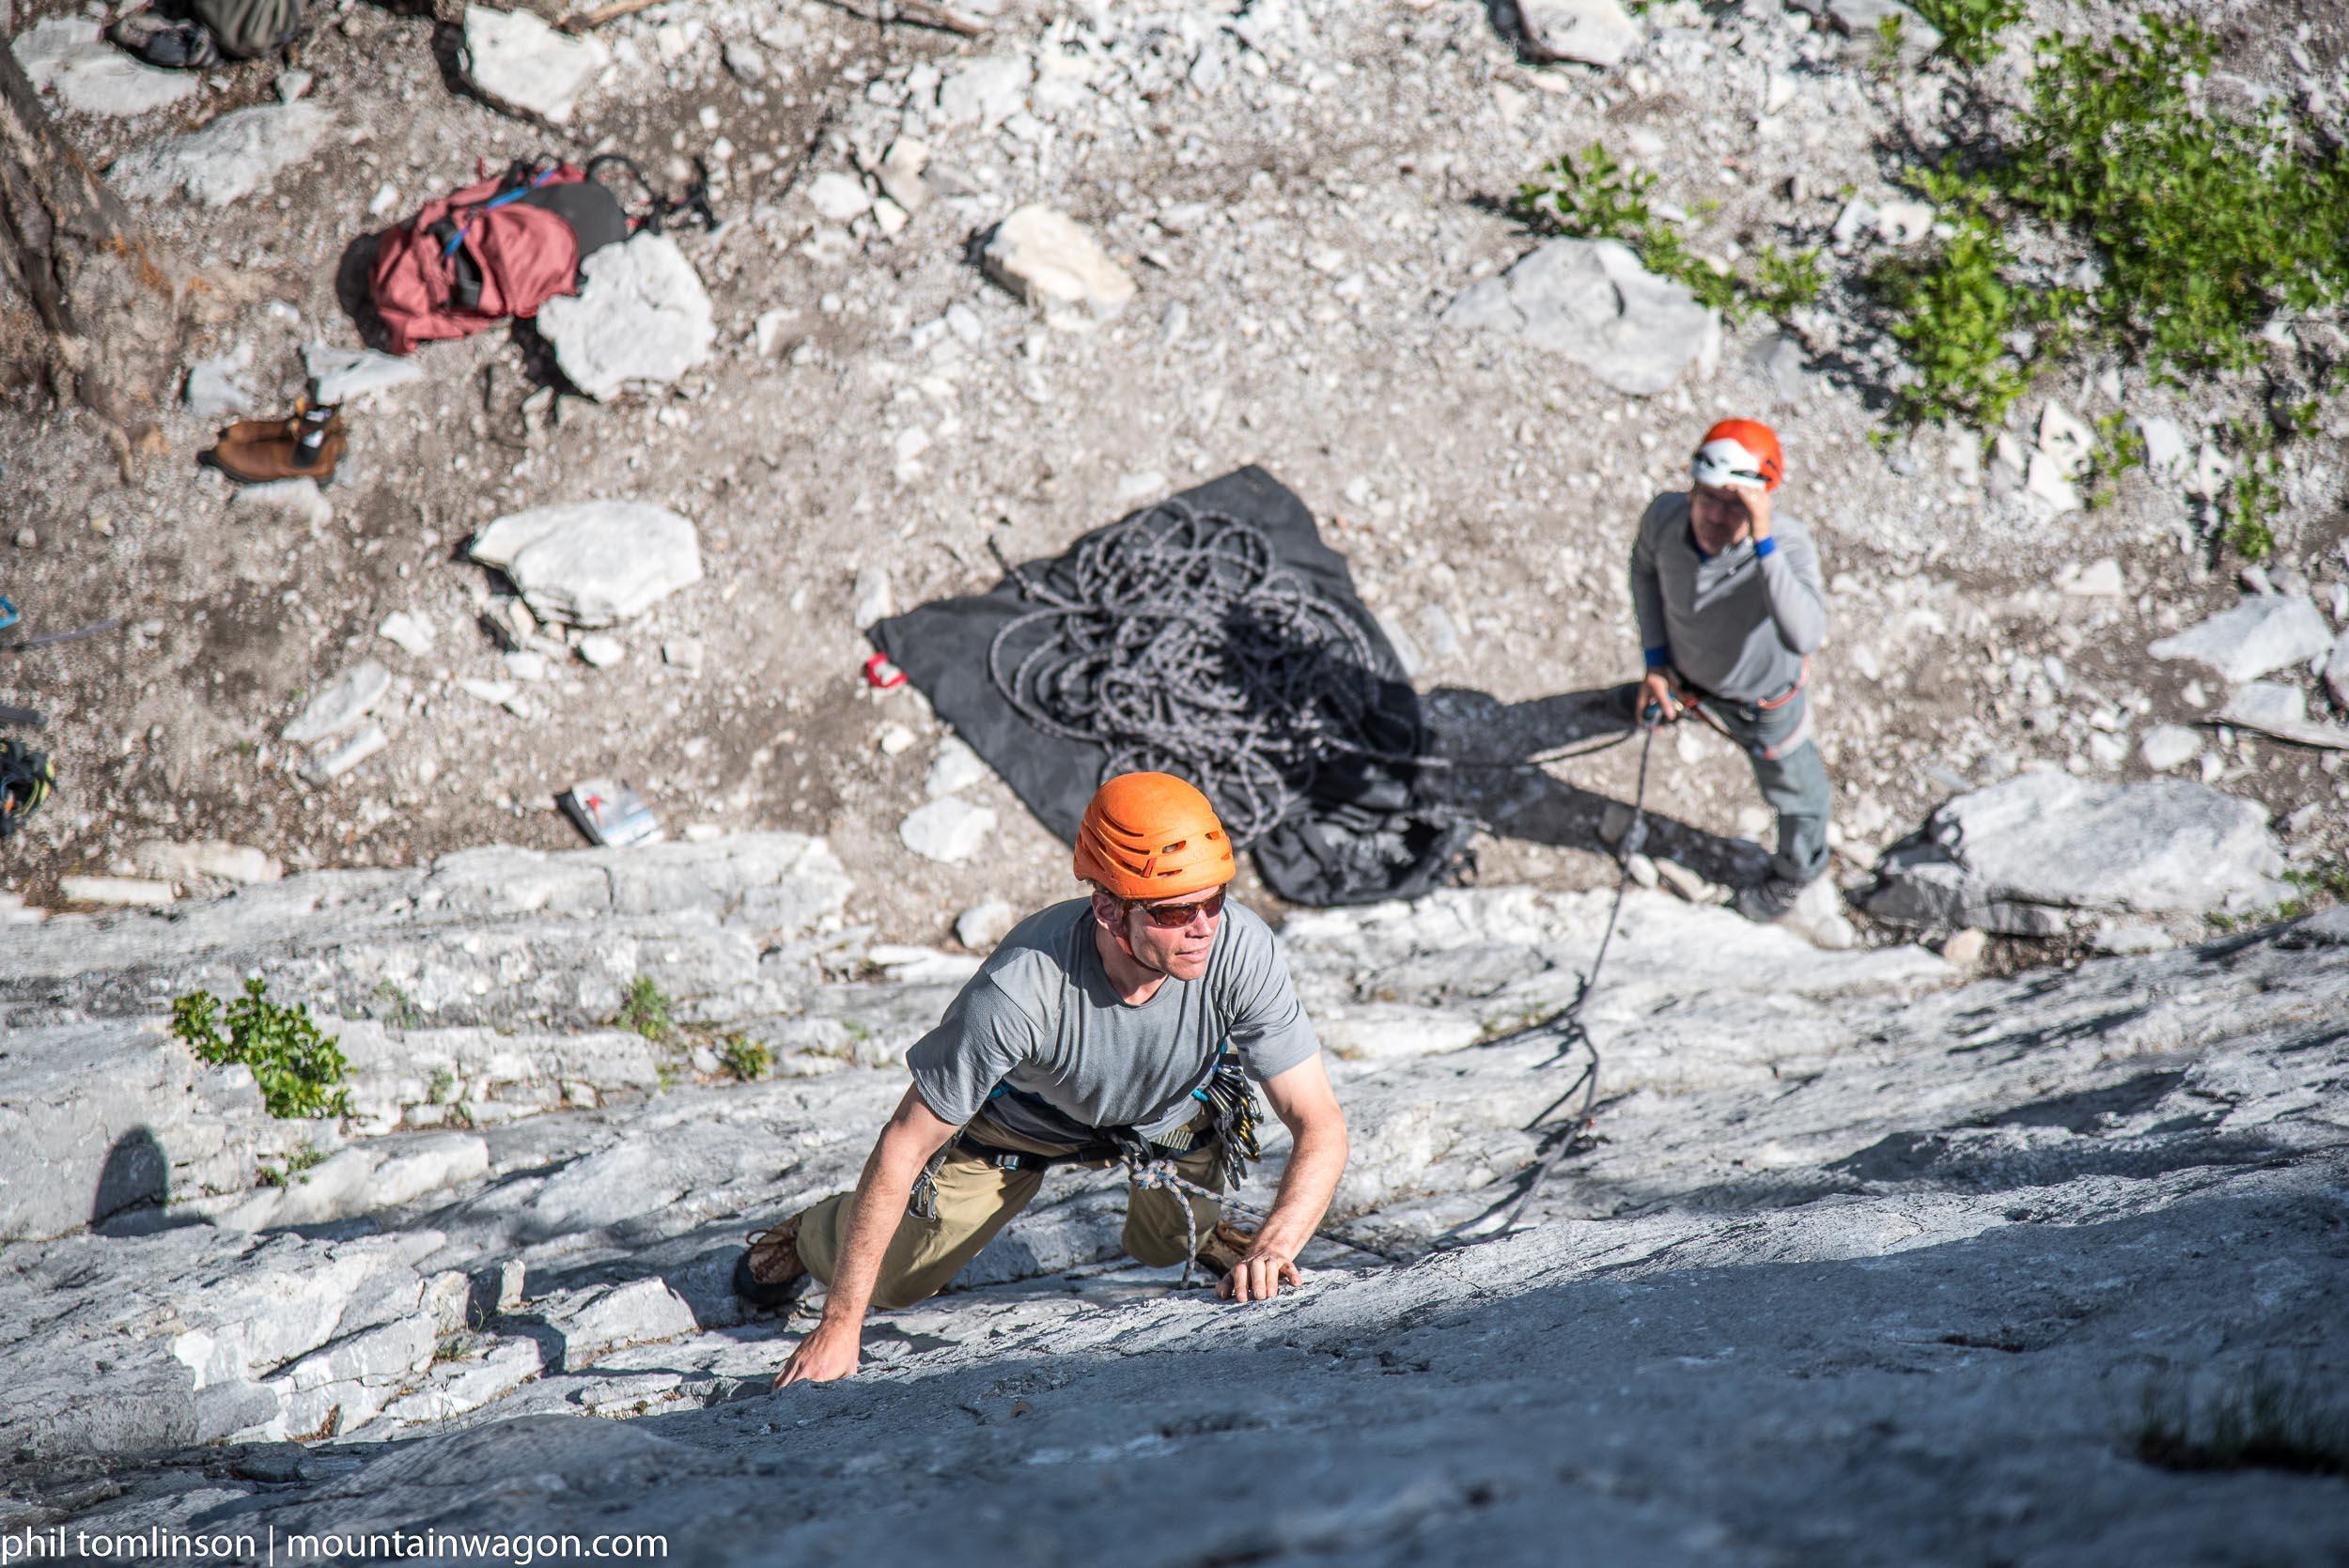 Paul headed into a 10c crux on Black Band Crag